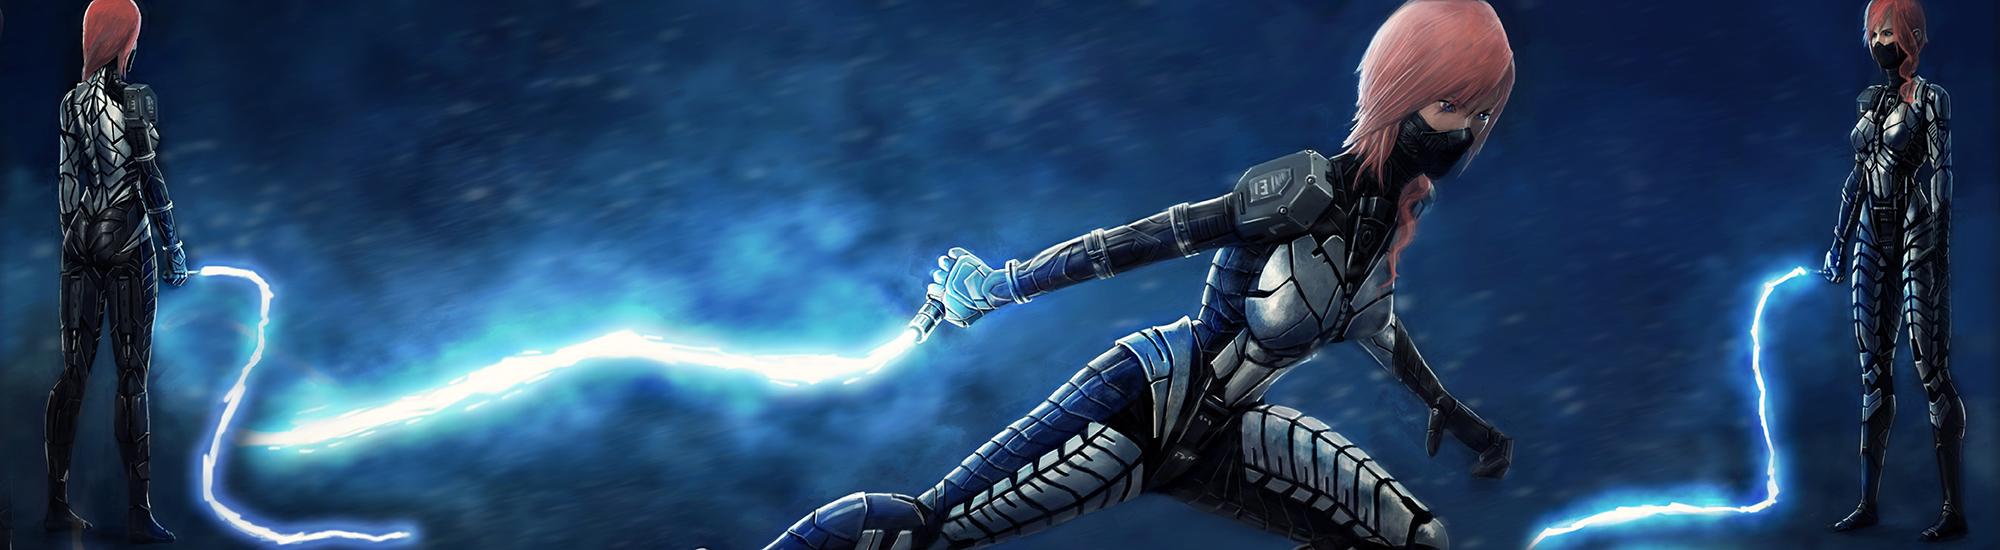 Lightning Returns by doneplay